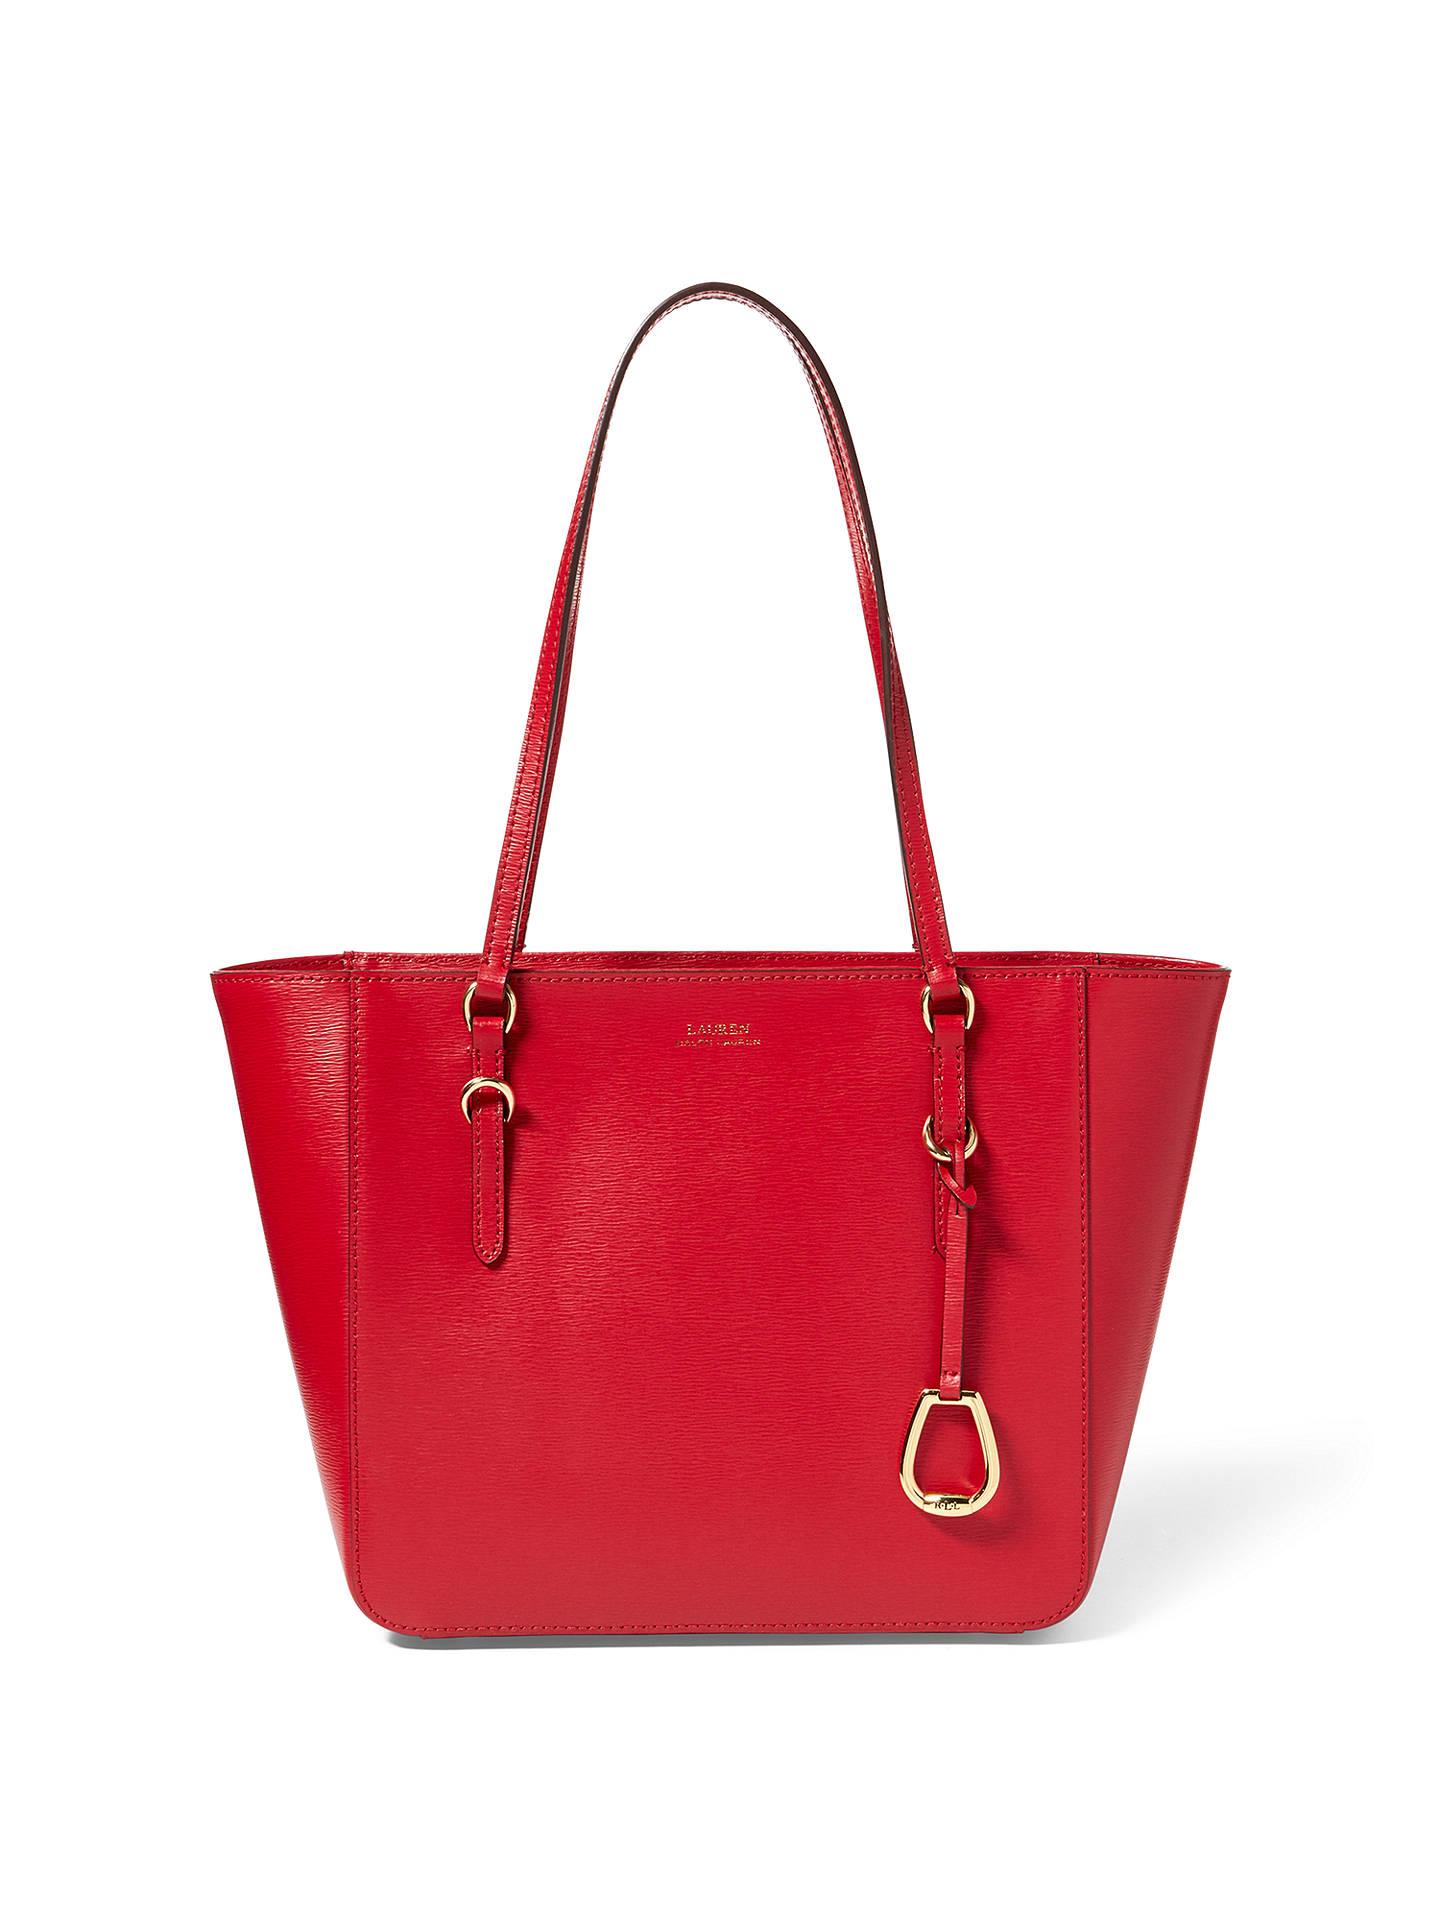 70e96e02ce3 ... BuyLauren Ralph Lauren Saffiano Leather Shopper Tote Bag, Red Online at  johnlewis.com ...